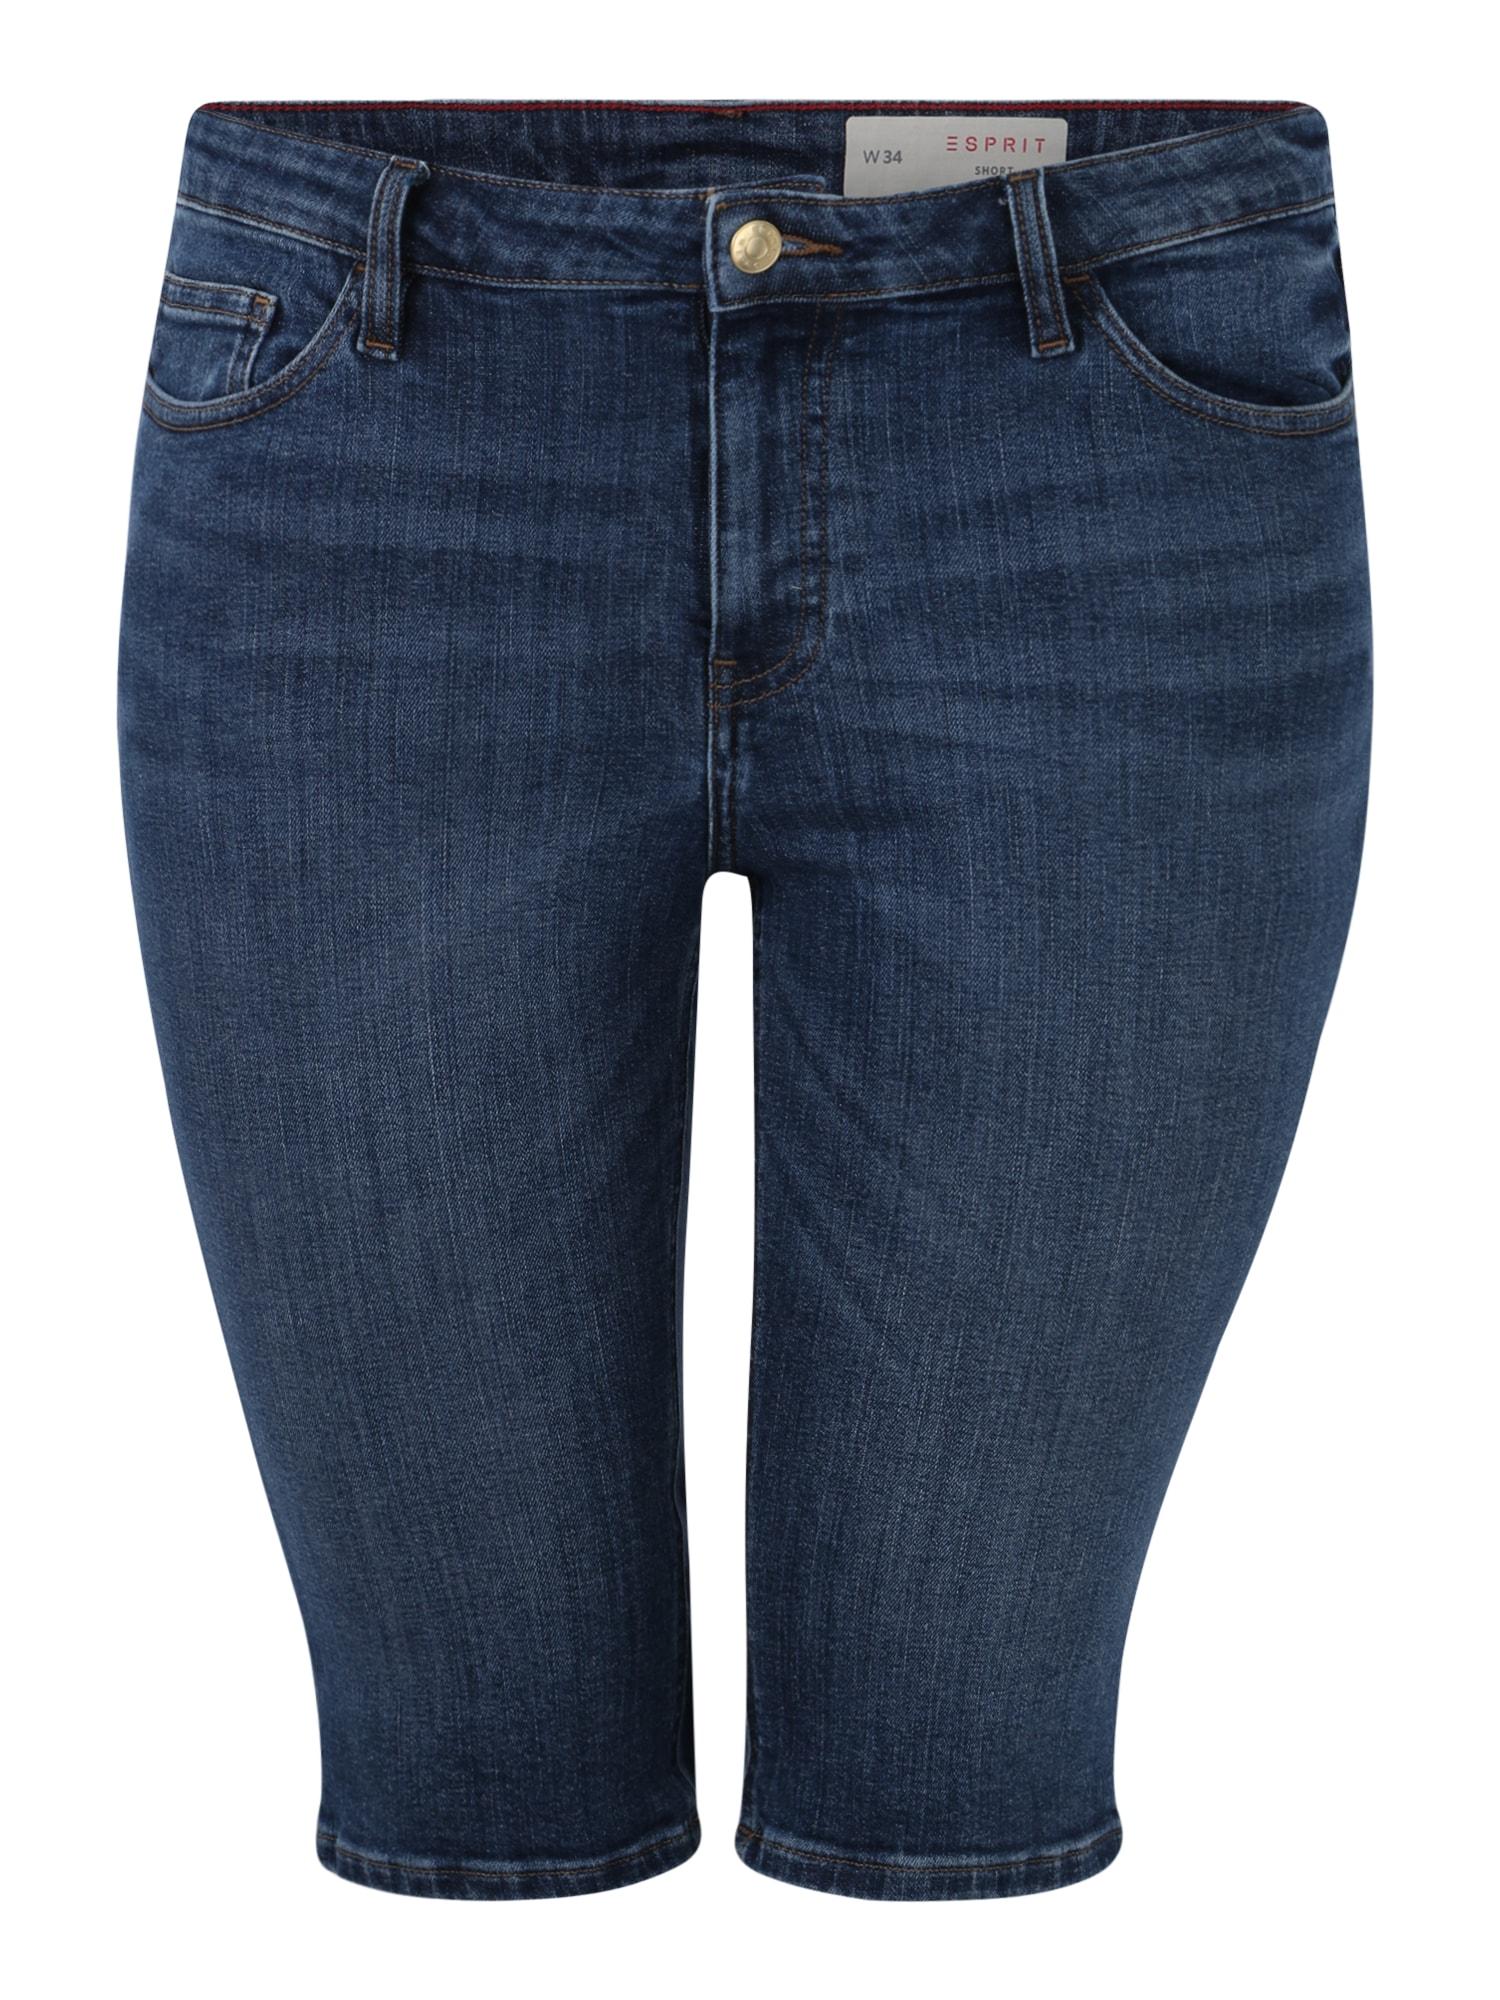 Džíny 049EE1C016 SHORTS modrá džínovina Esprit Curves